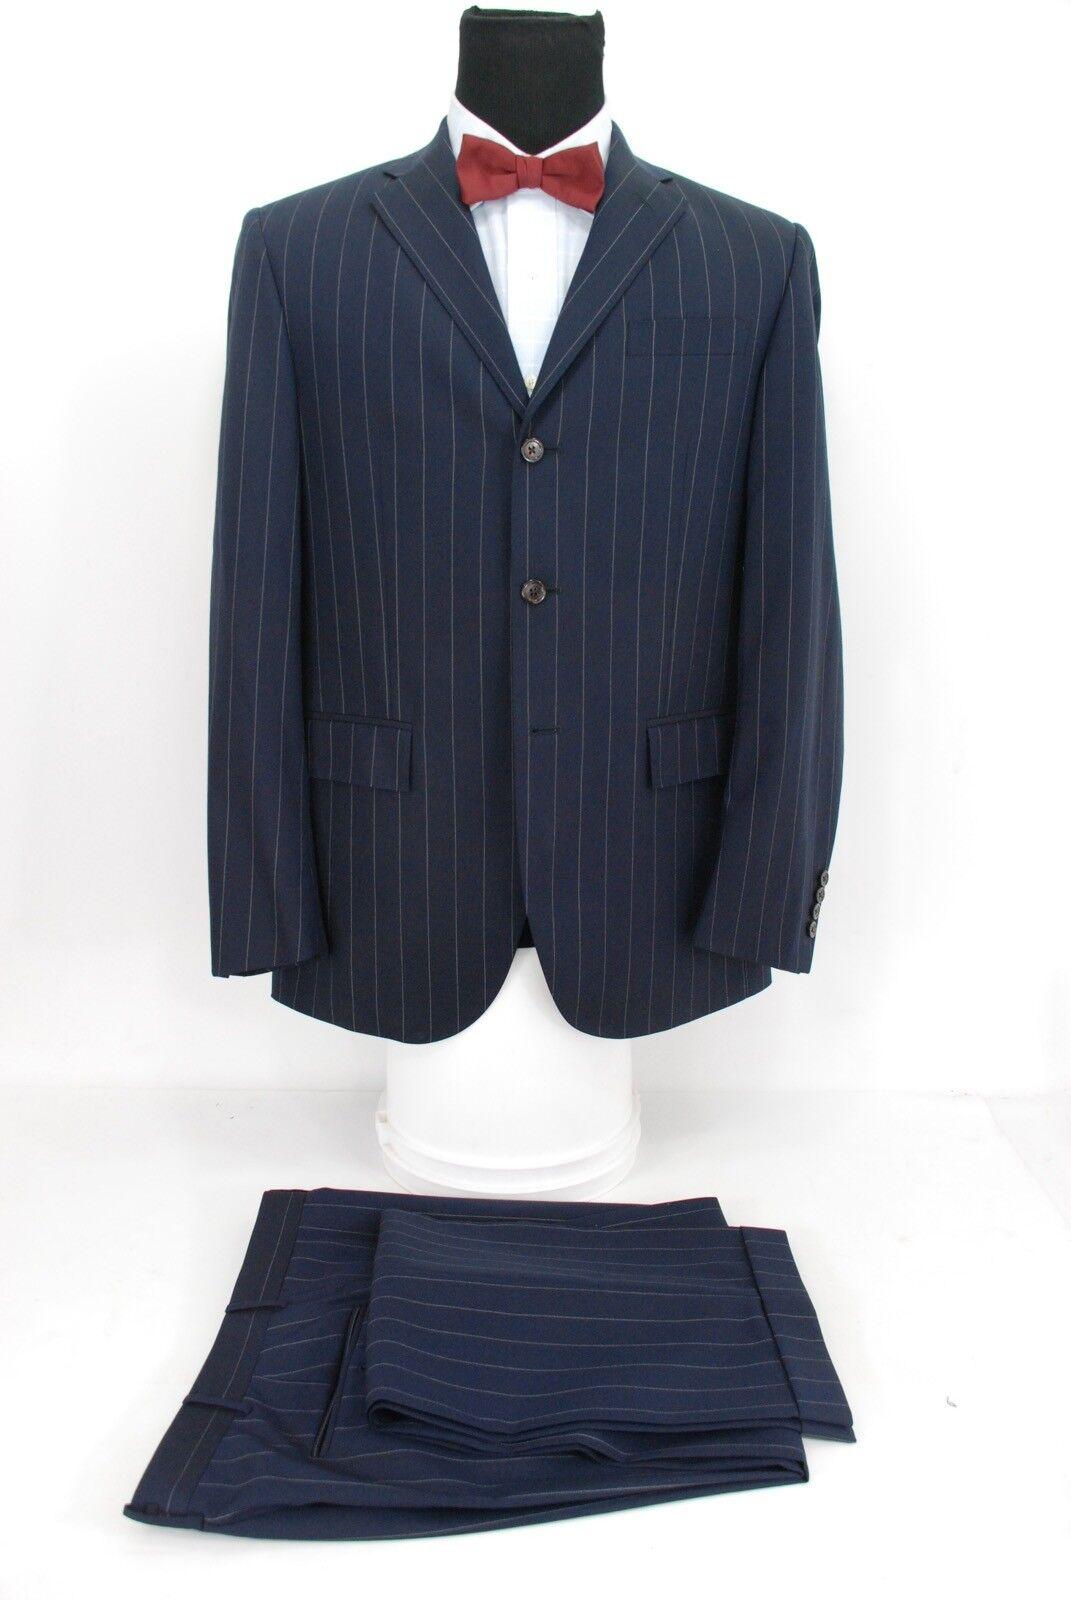 Polo Ralph Lauren  3Btn Men's Suit Navy bluee Pinstripe Wool 40R